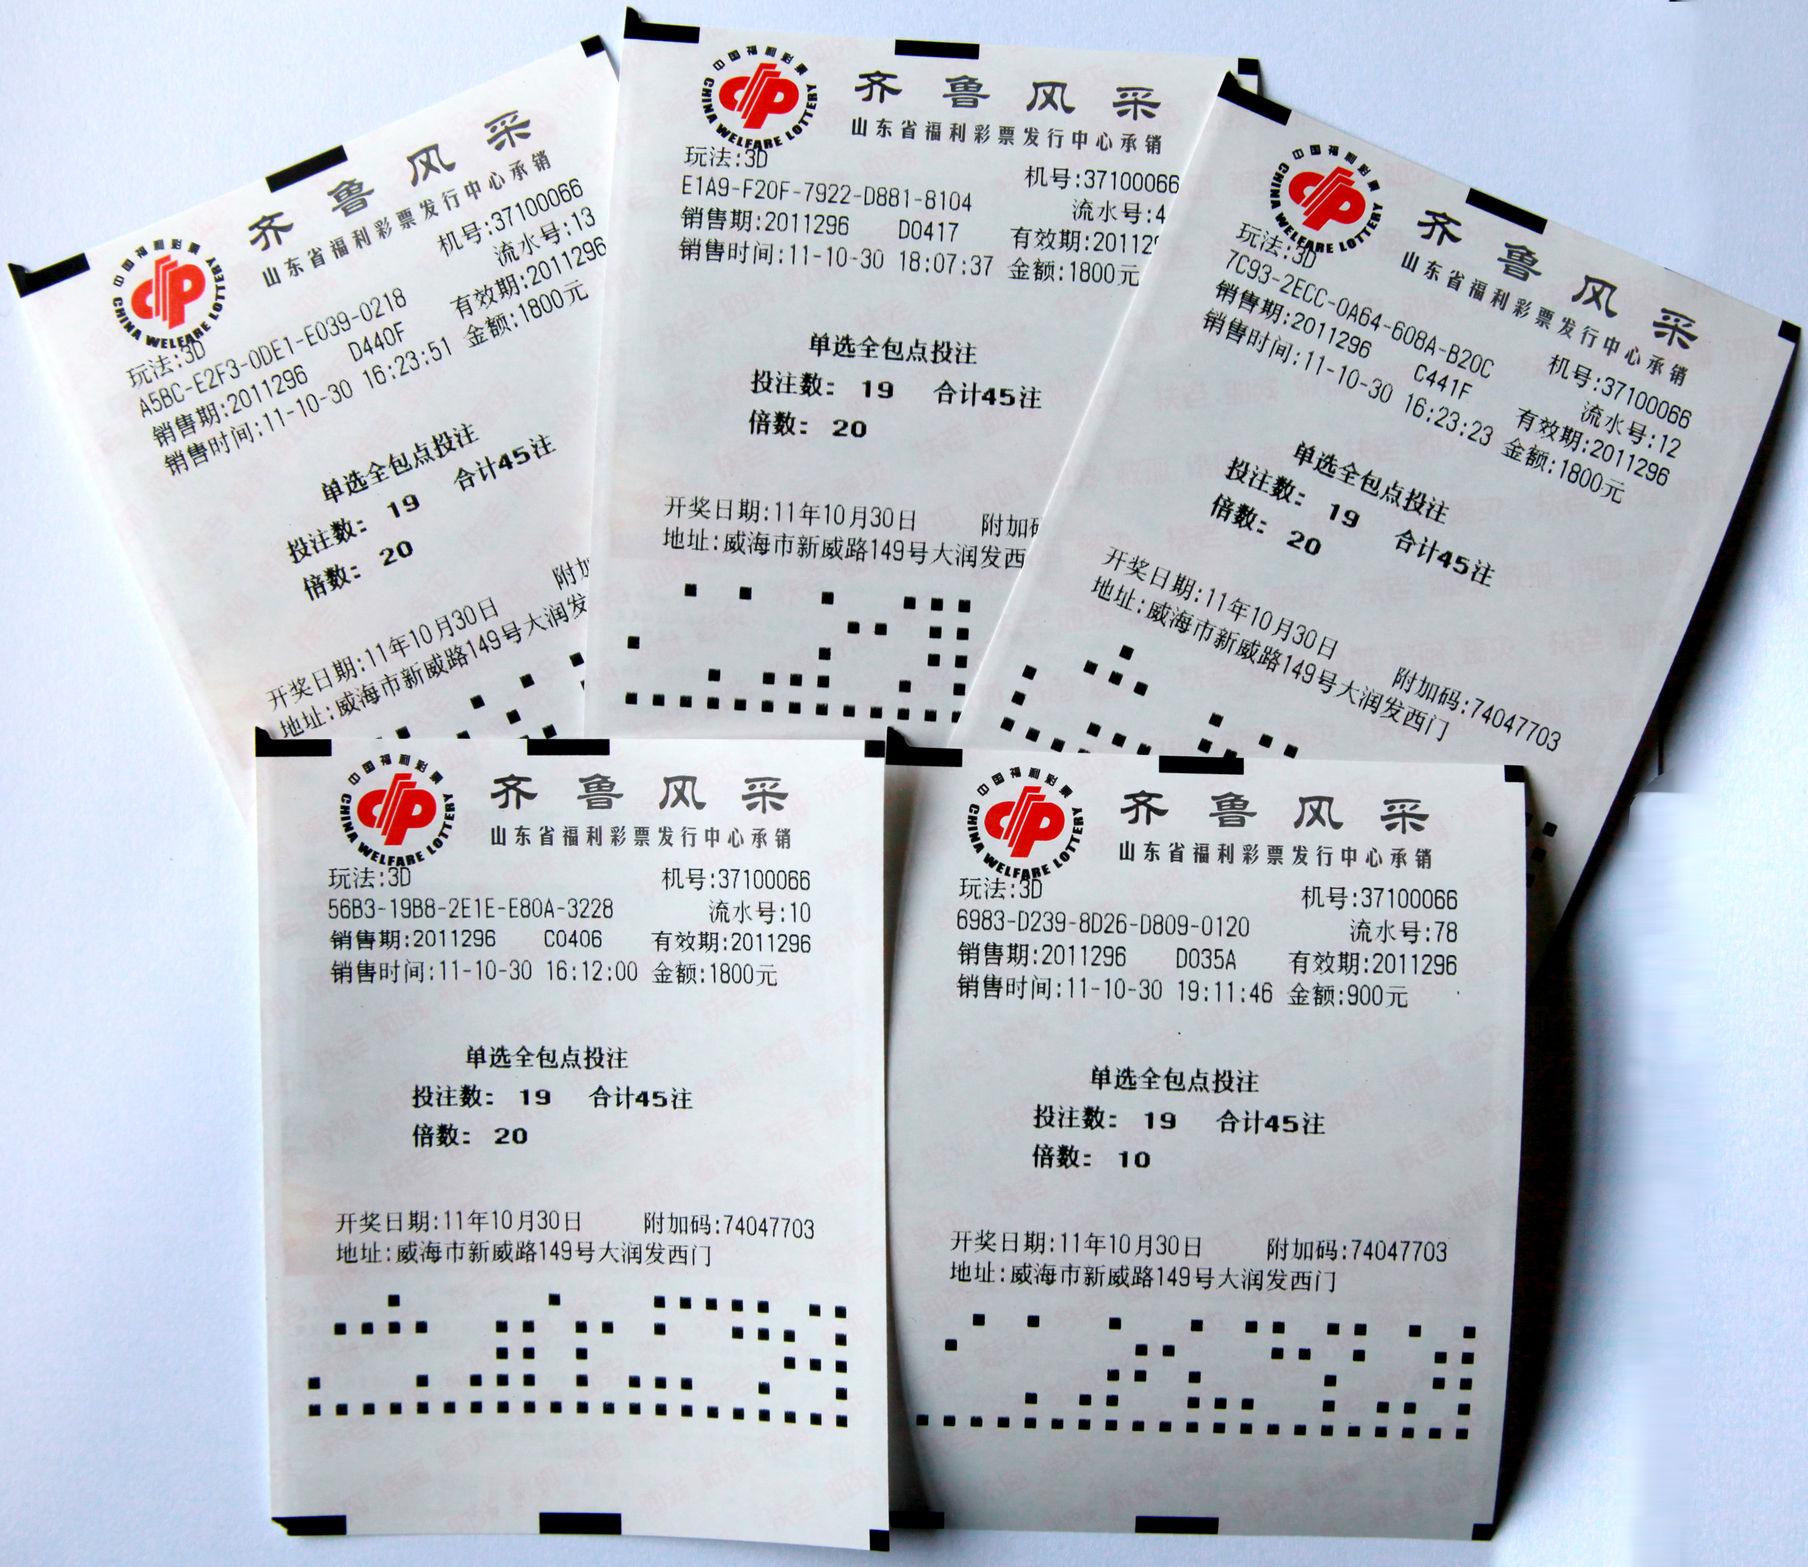 pc28怎什么类型的彩票?